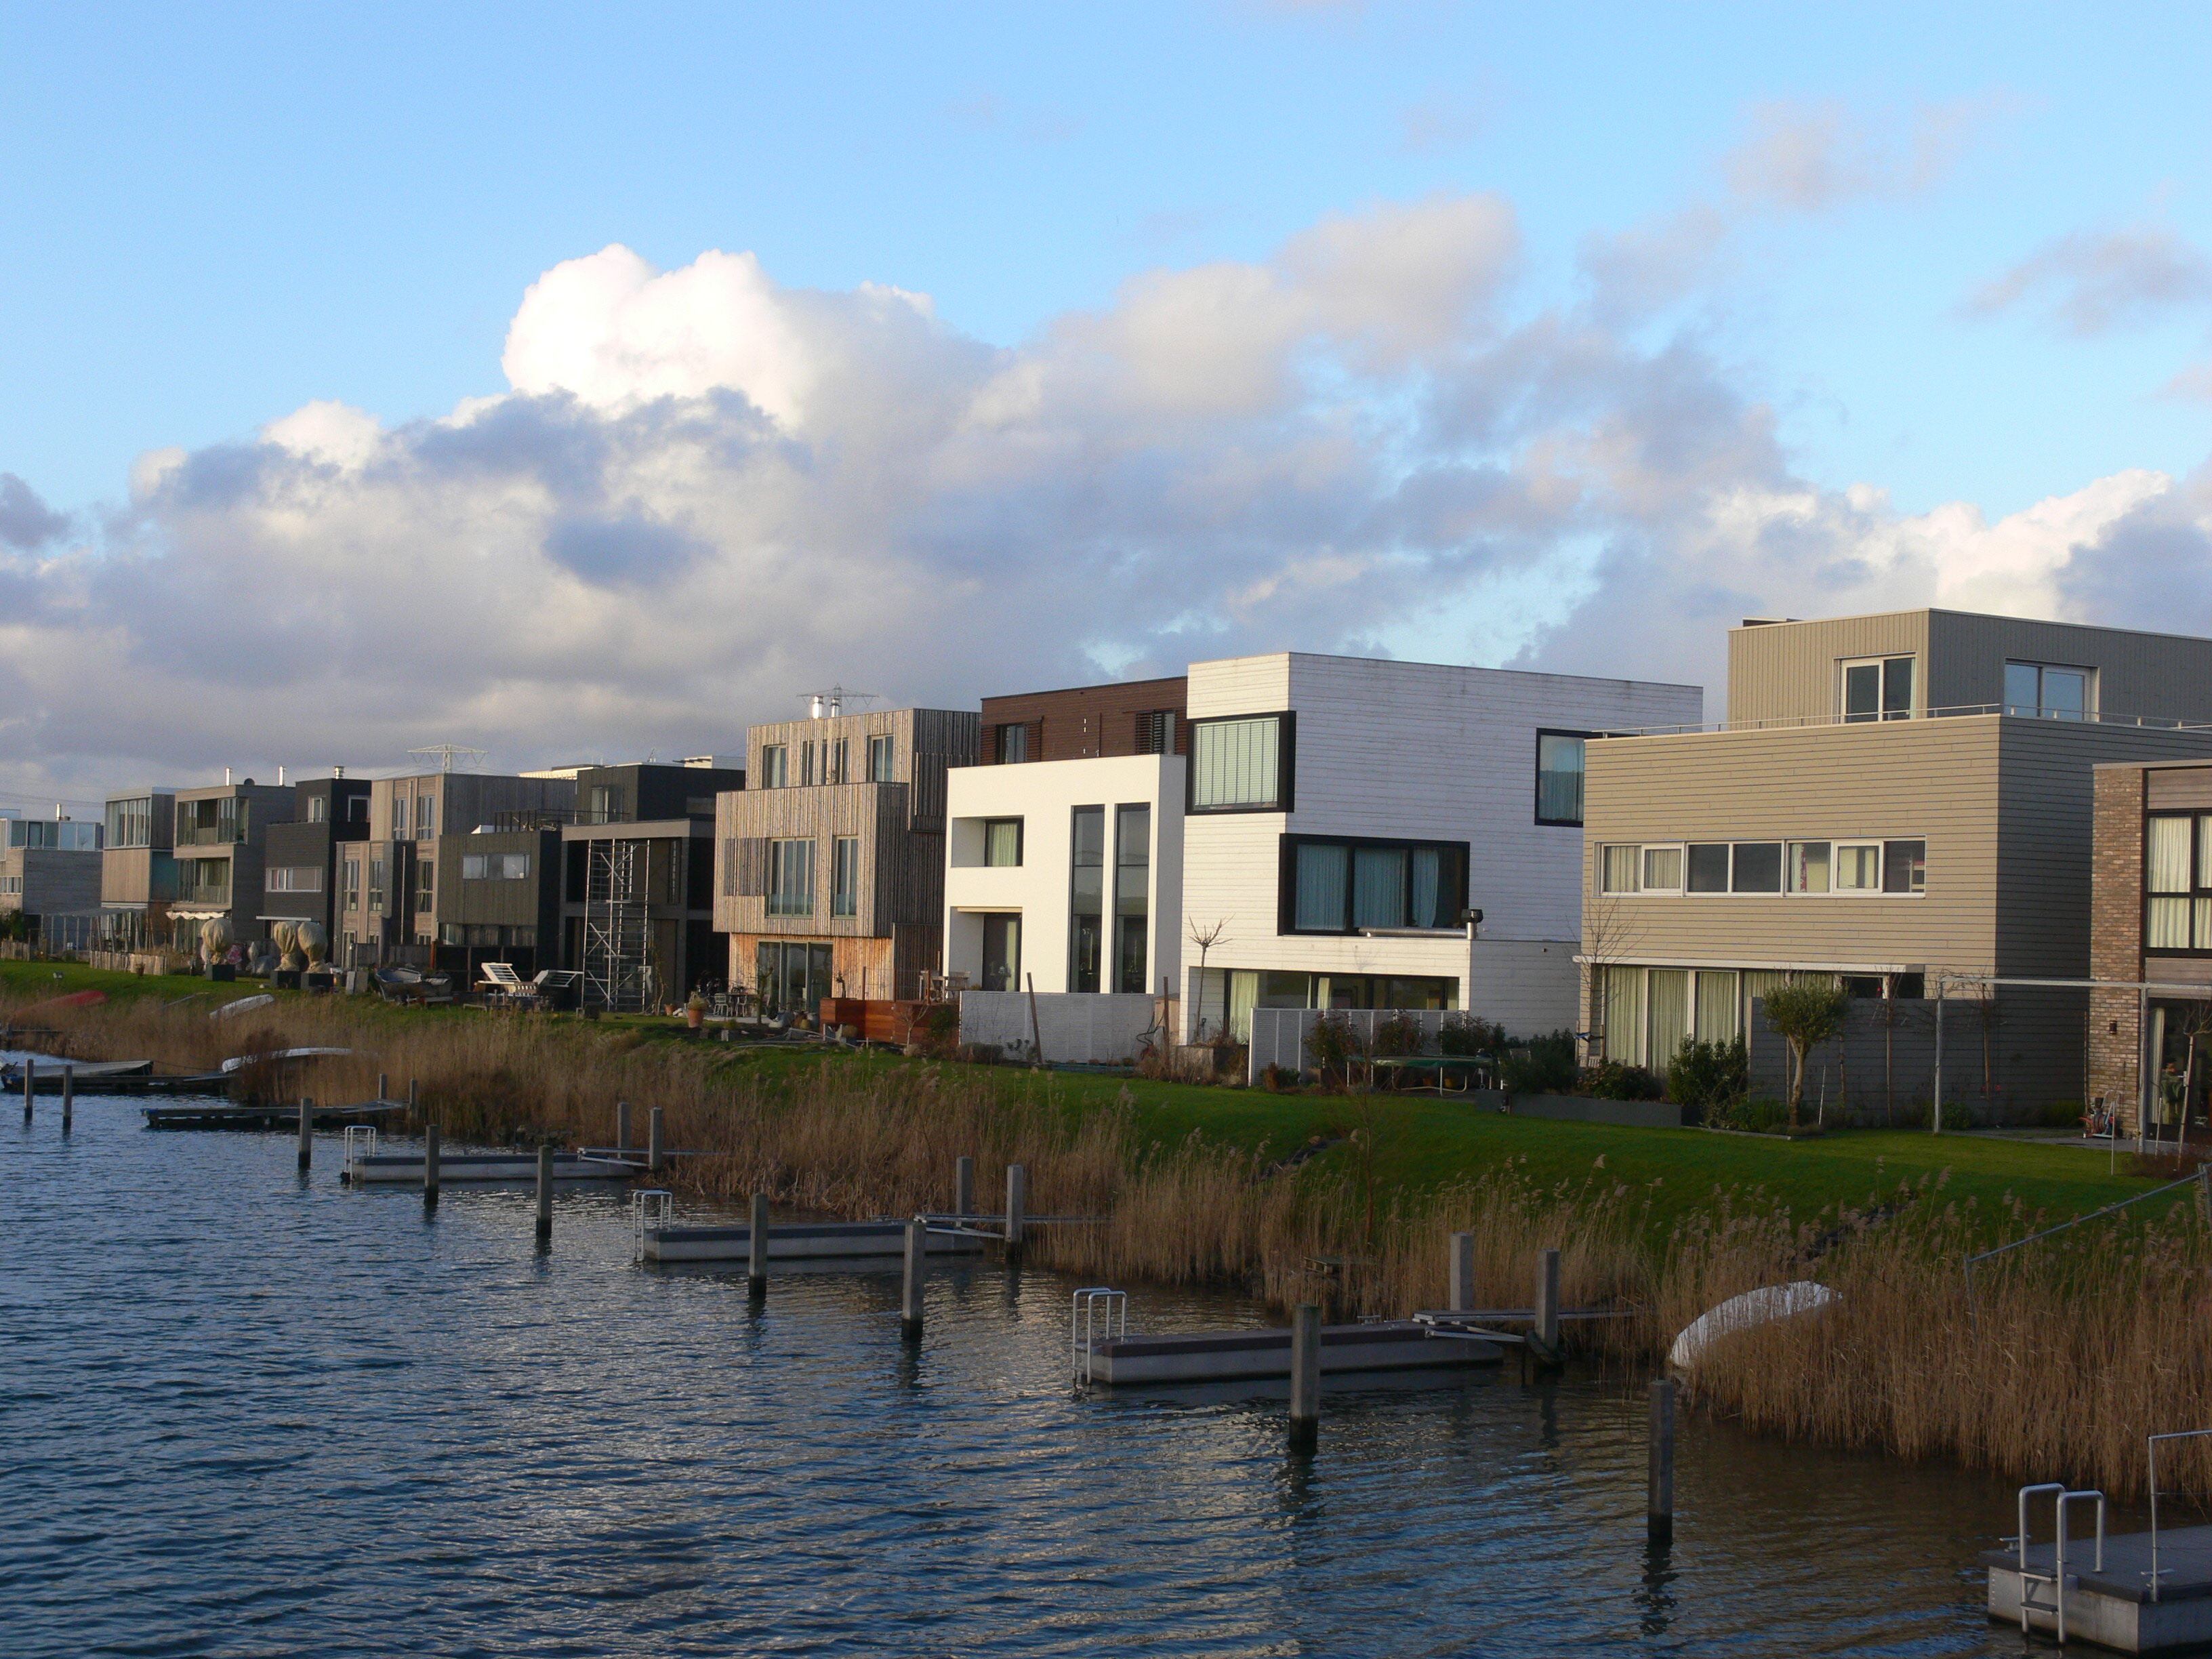 File:Amsterdam - IJburg 24.JPG - Wikimedia Commons